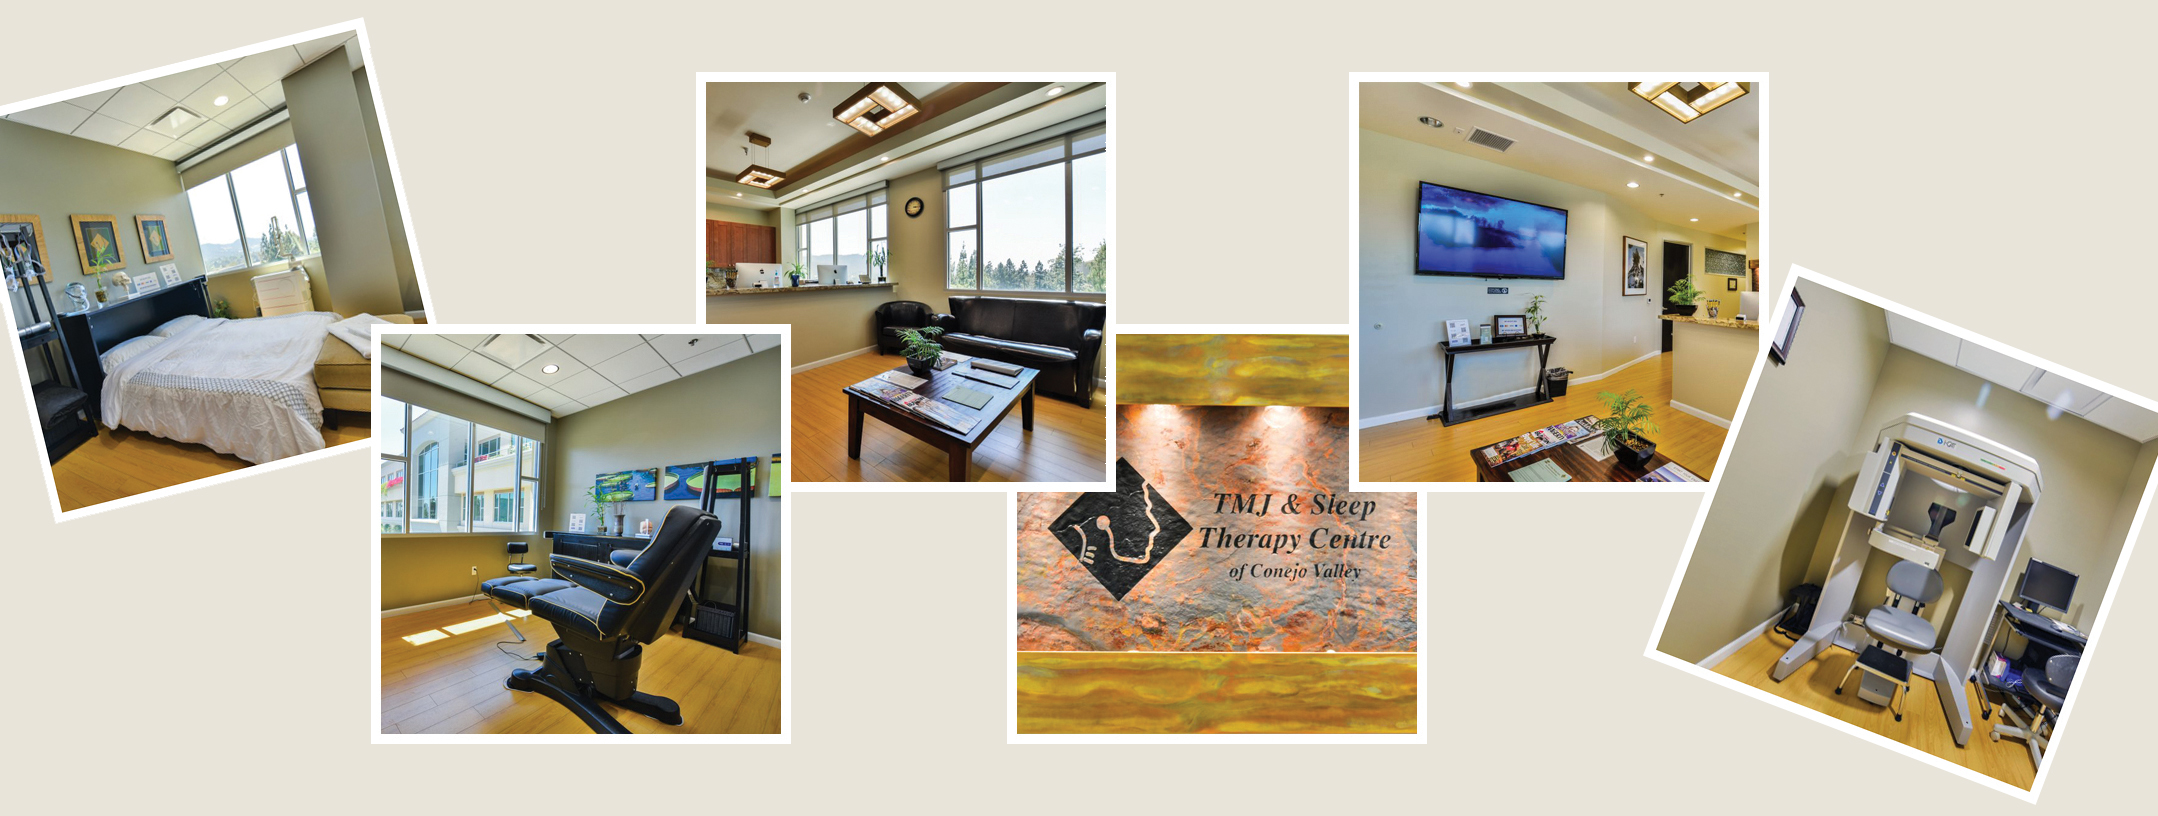 TMJ Sleep & Therapy Centre